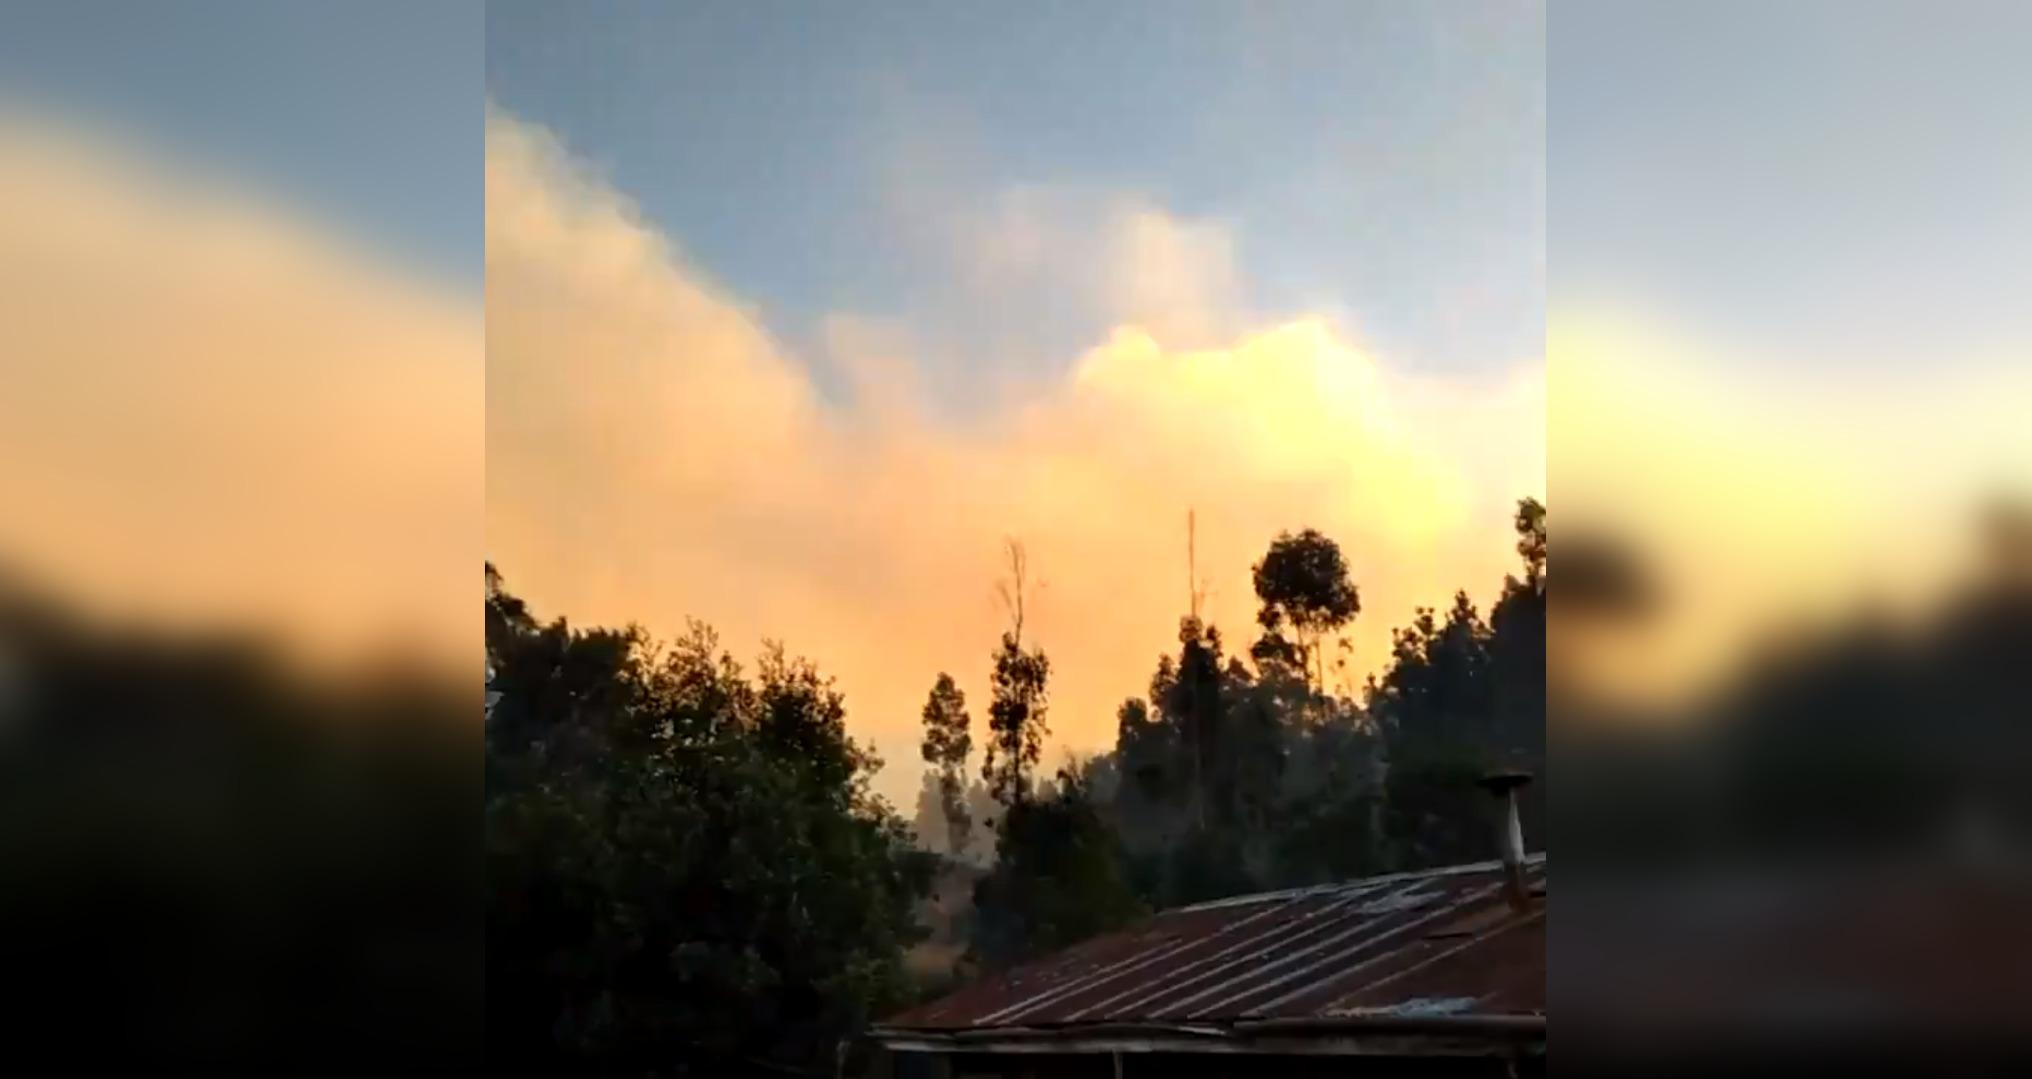 incendio-forestal-islarey2.jpg